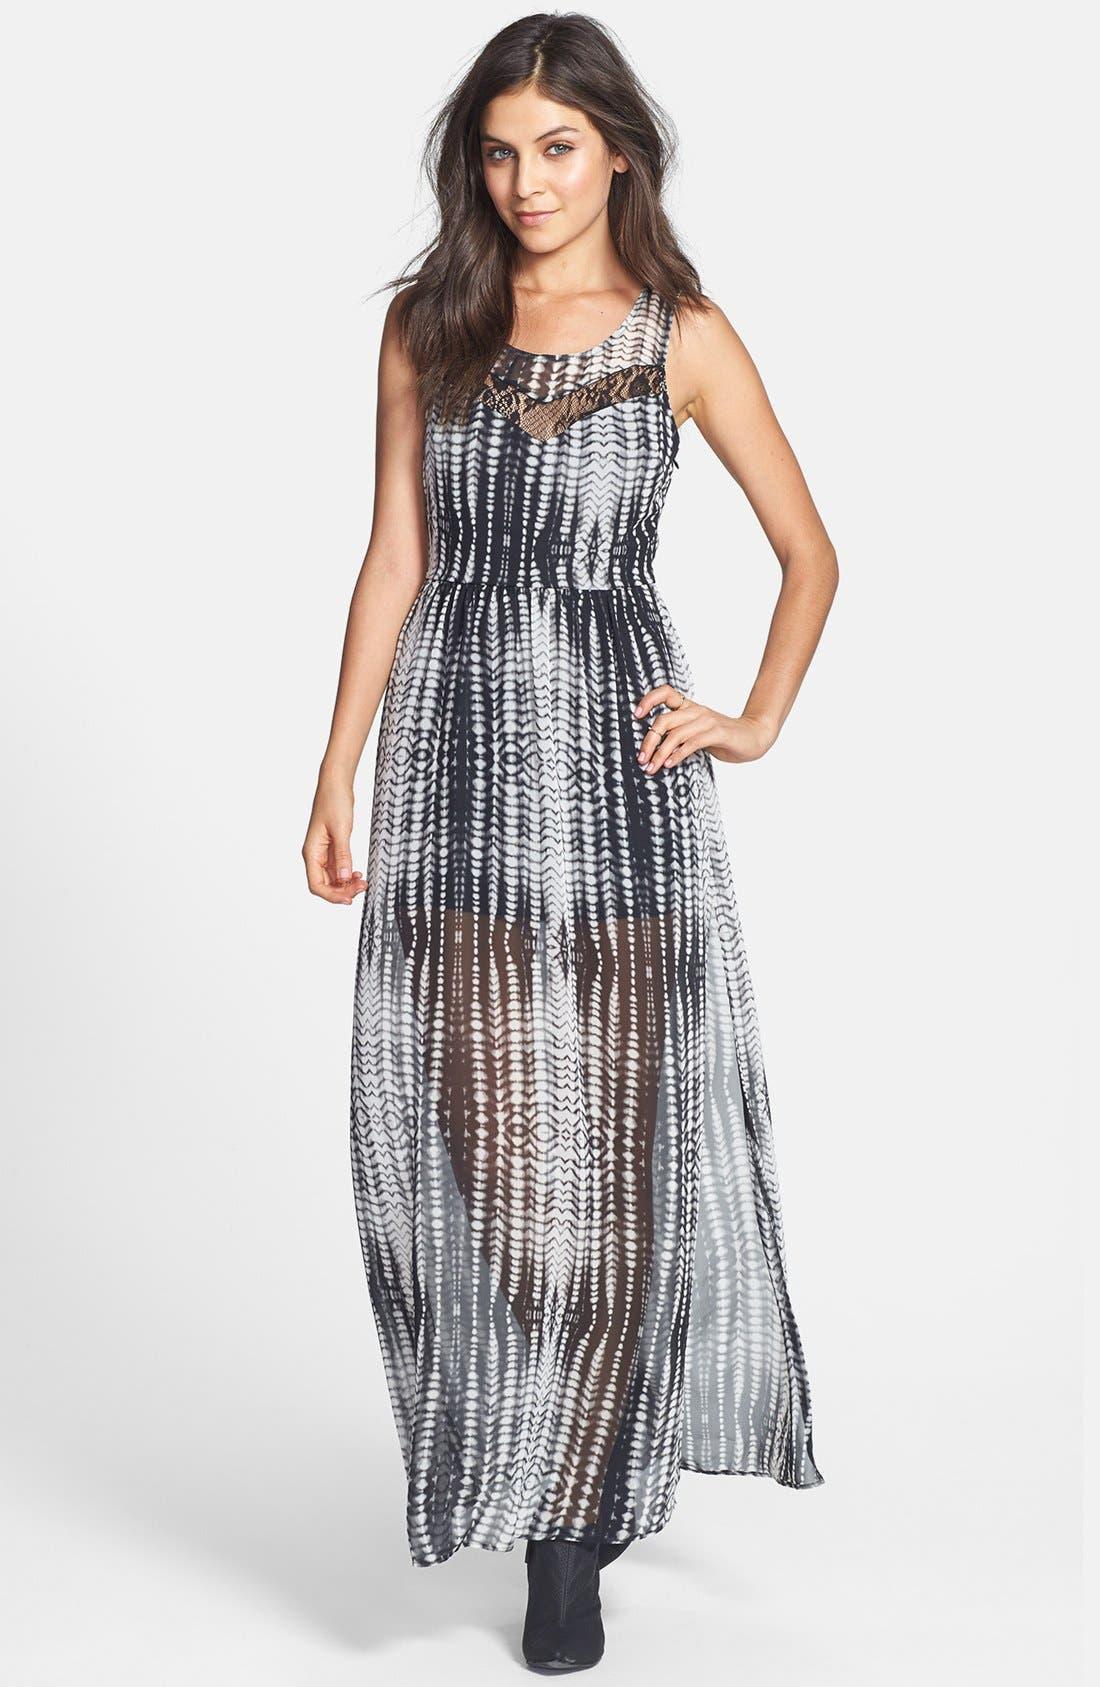 Main Image - Lace Inset Print Maxi Dress